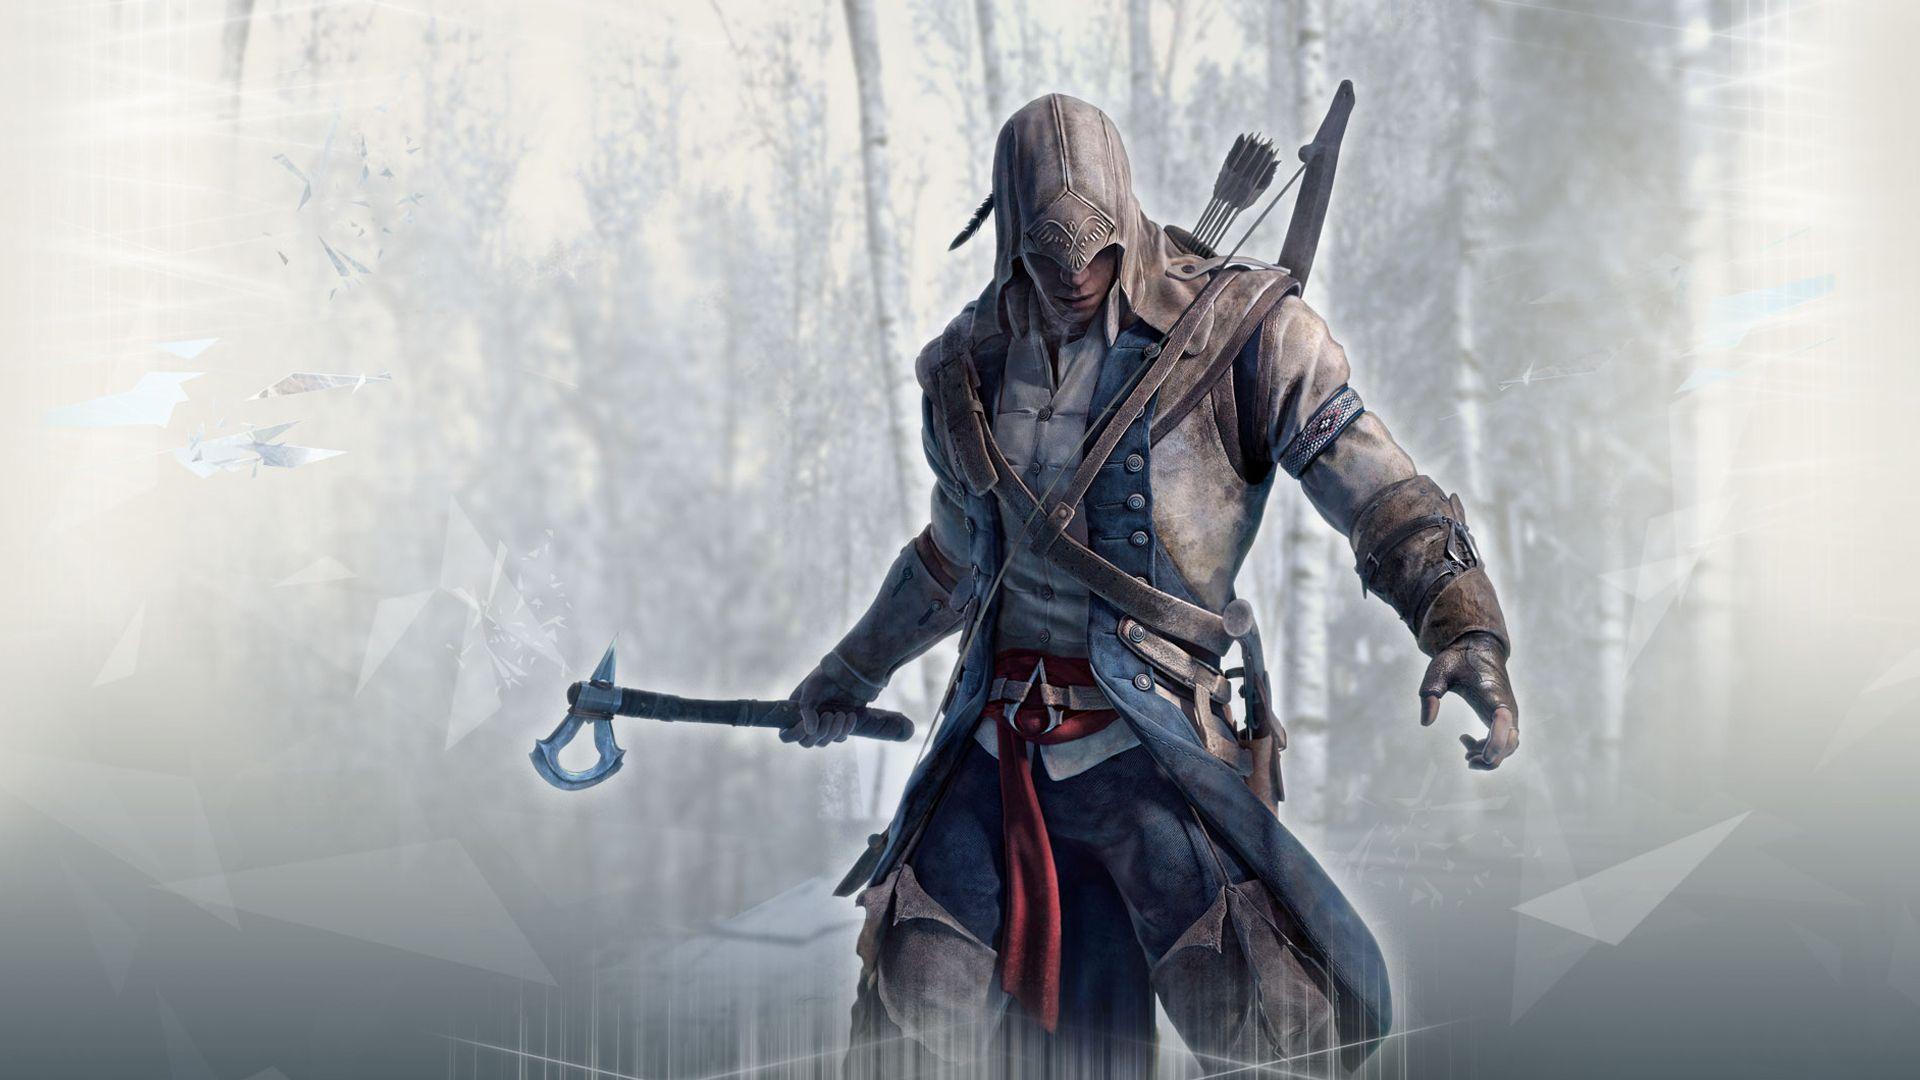 Assassin Wallpaper Assassins Creed Iii Ac3 Assassins Creed 3